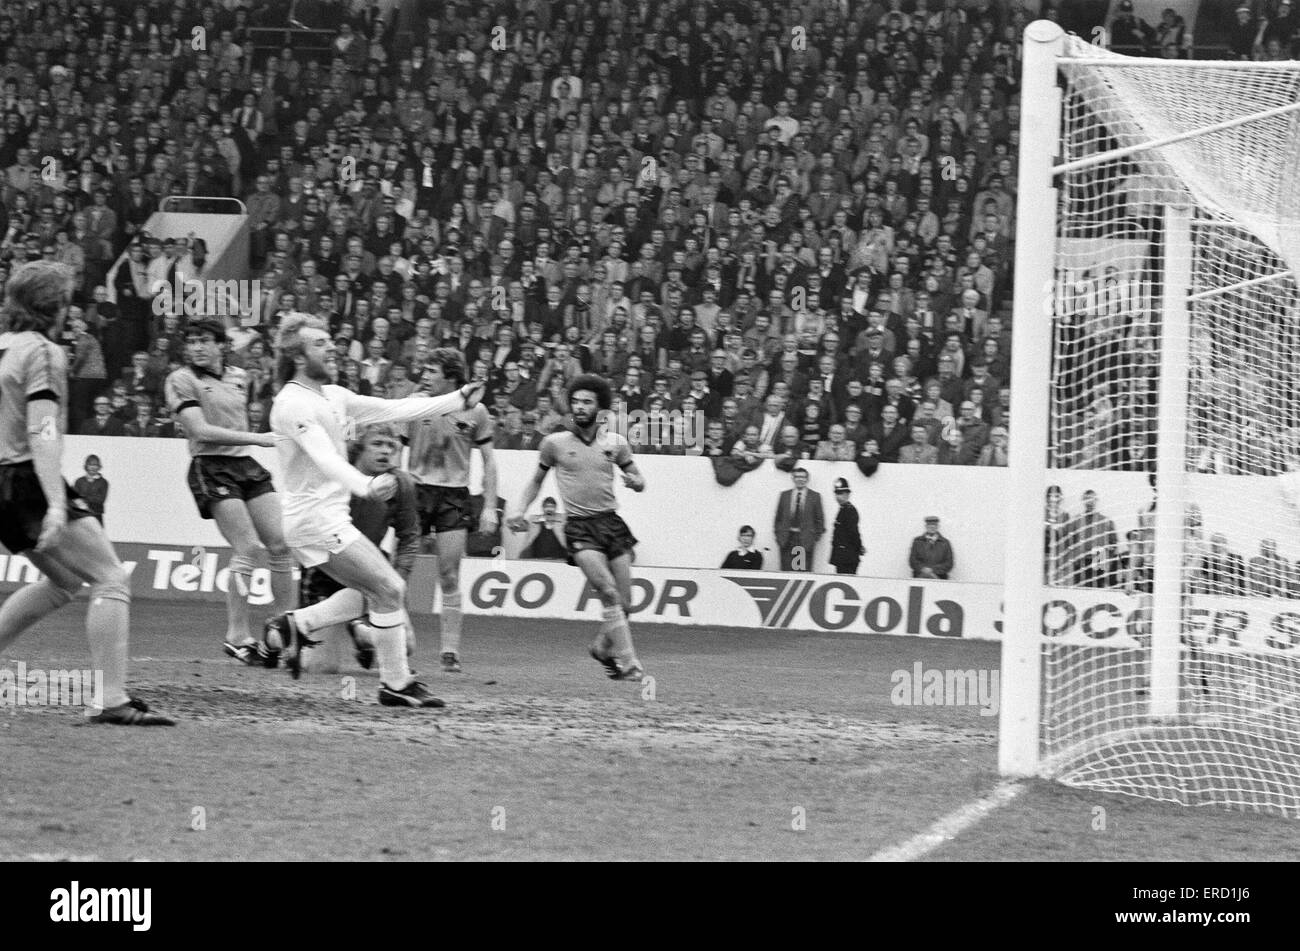 Spurs V Wolves FA Cup Semi Final Played At Hillsborough Steve Archibald Celebrates Scoring